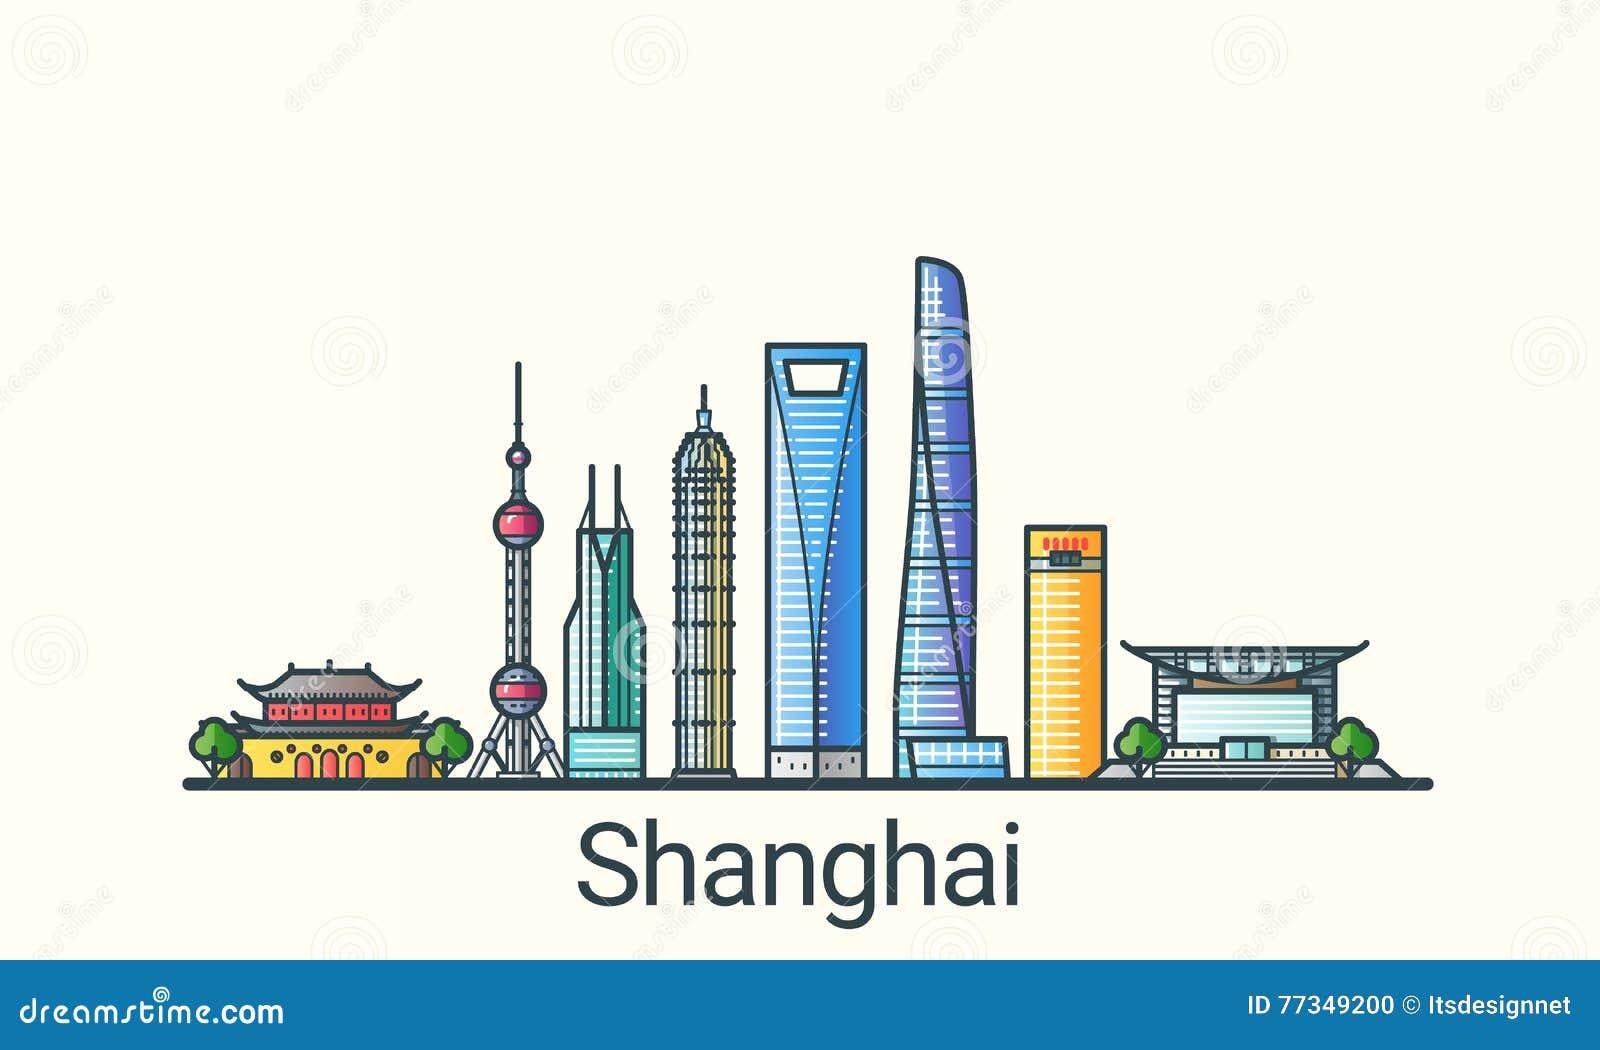 Shanghai Cartoons Illustrations Amp Vector Stock Images